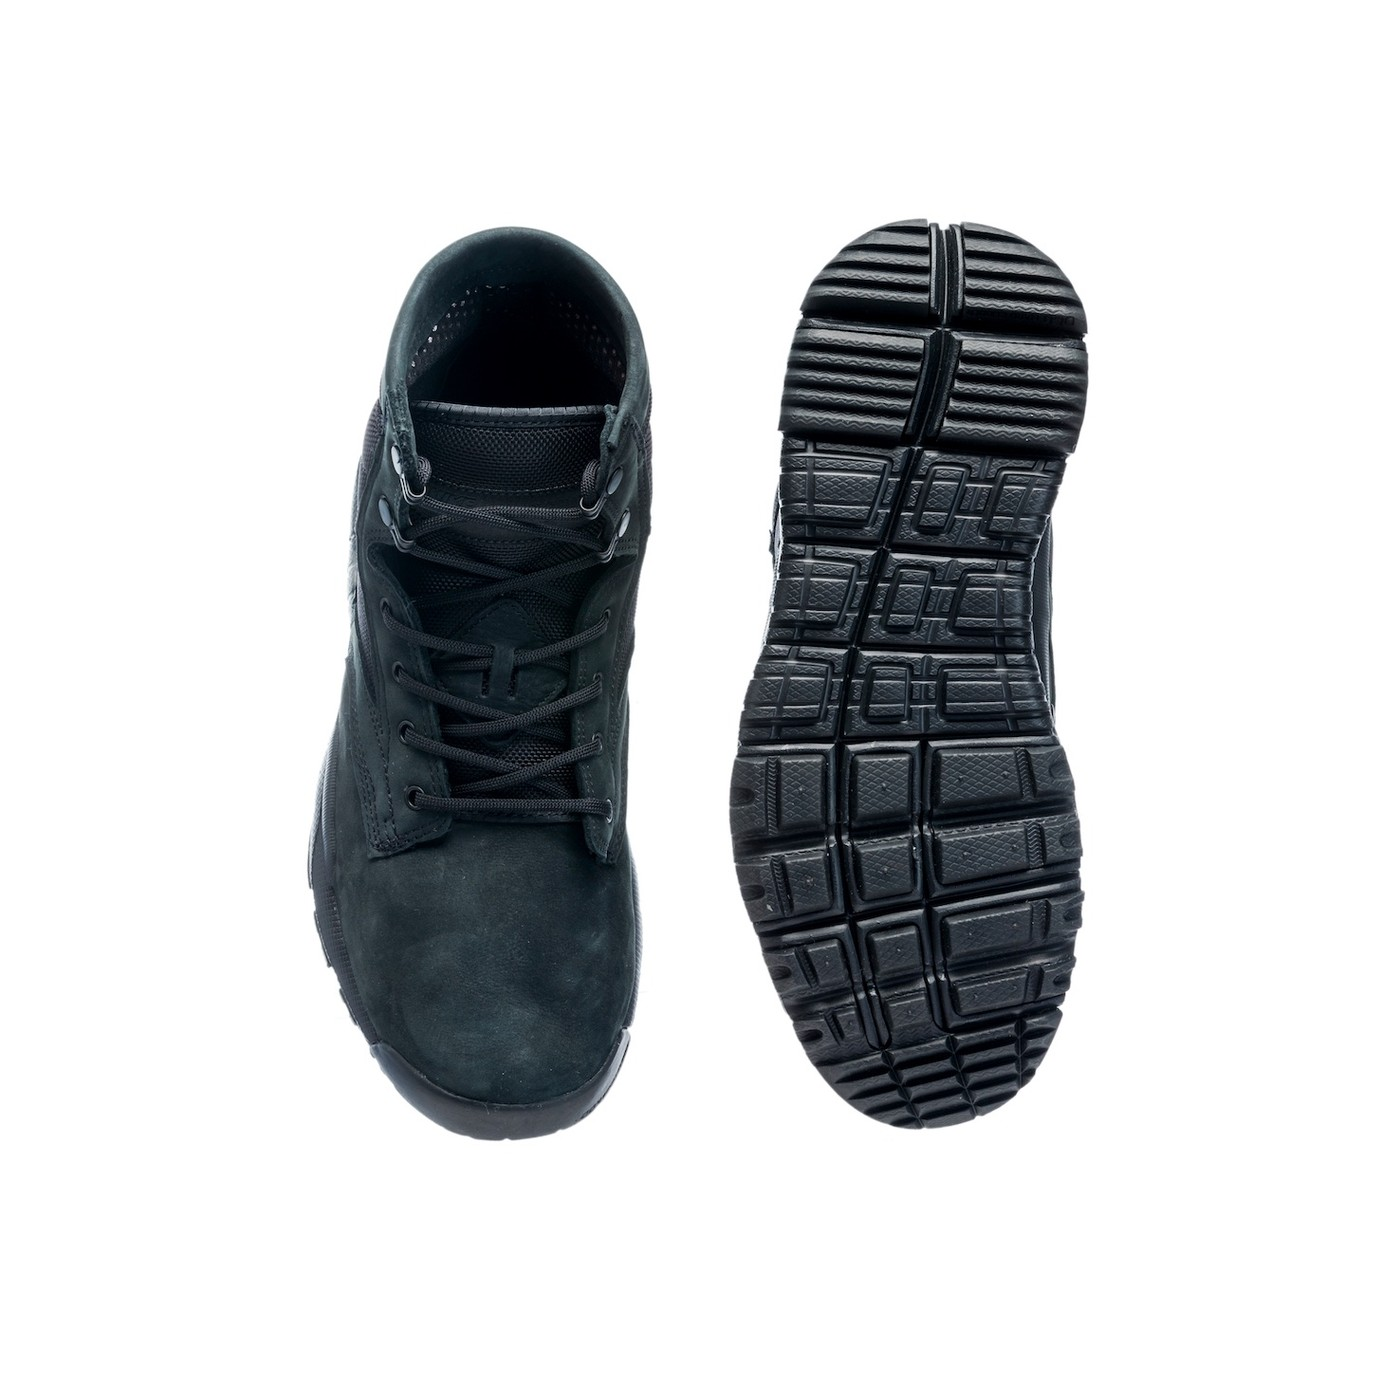 Черевики чоловічі Nike SFB SPECIAL FIELD